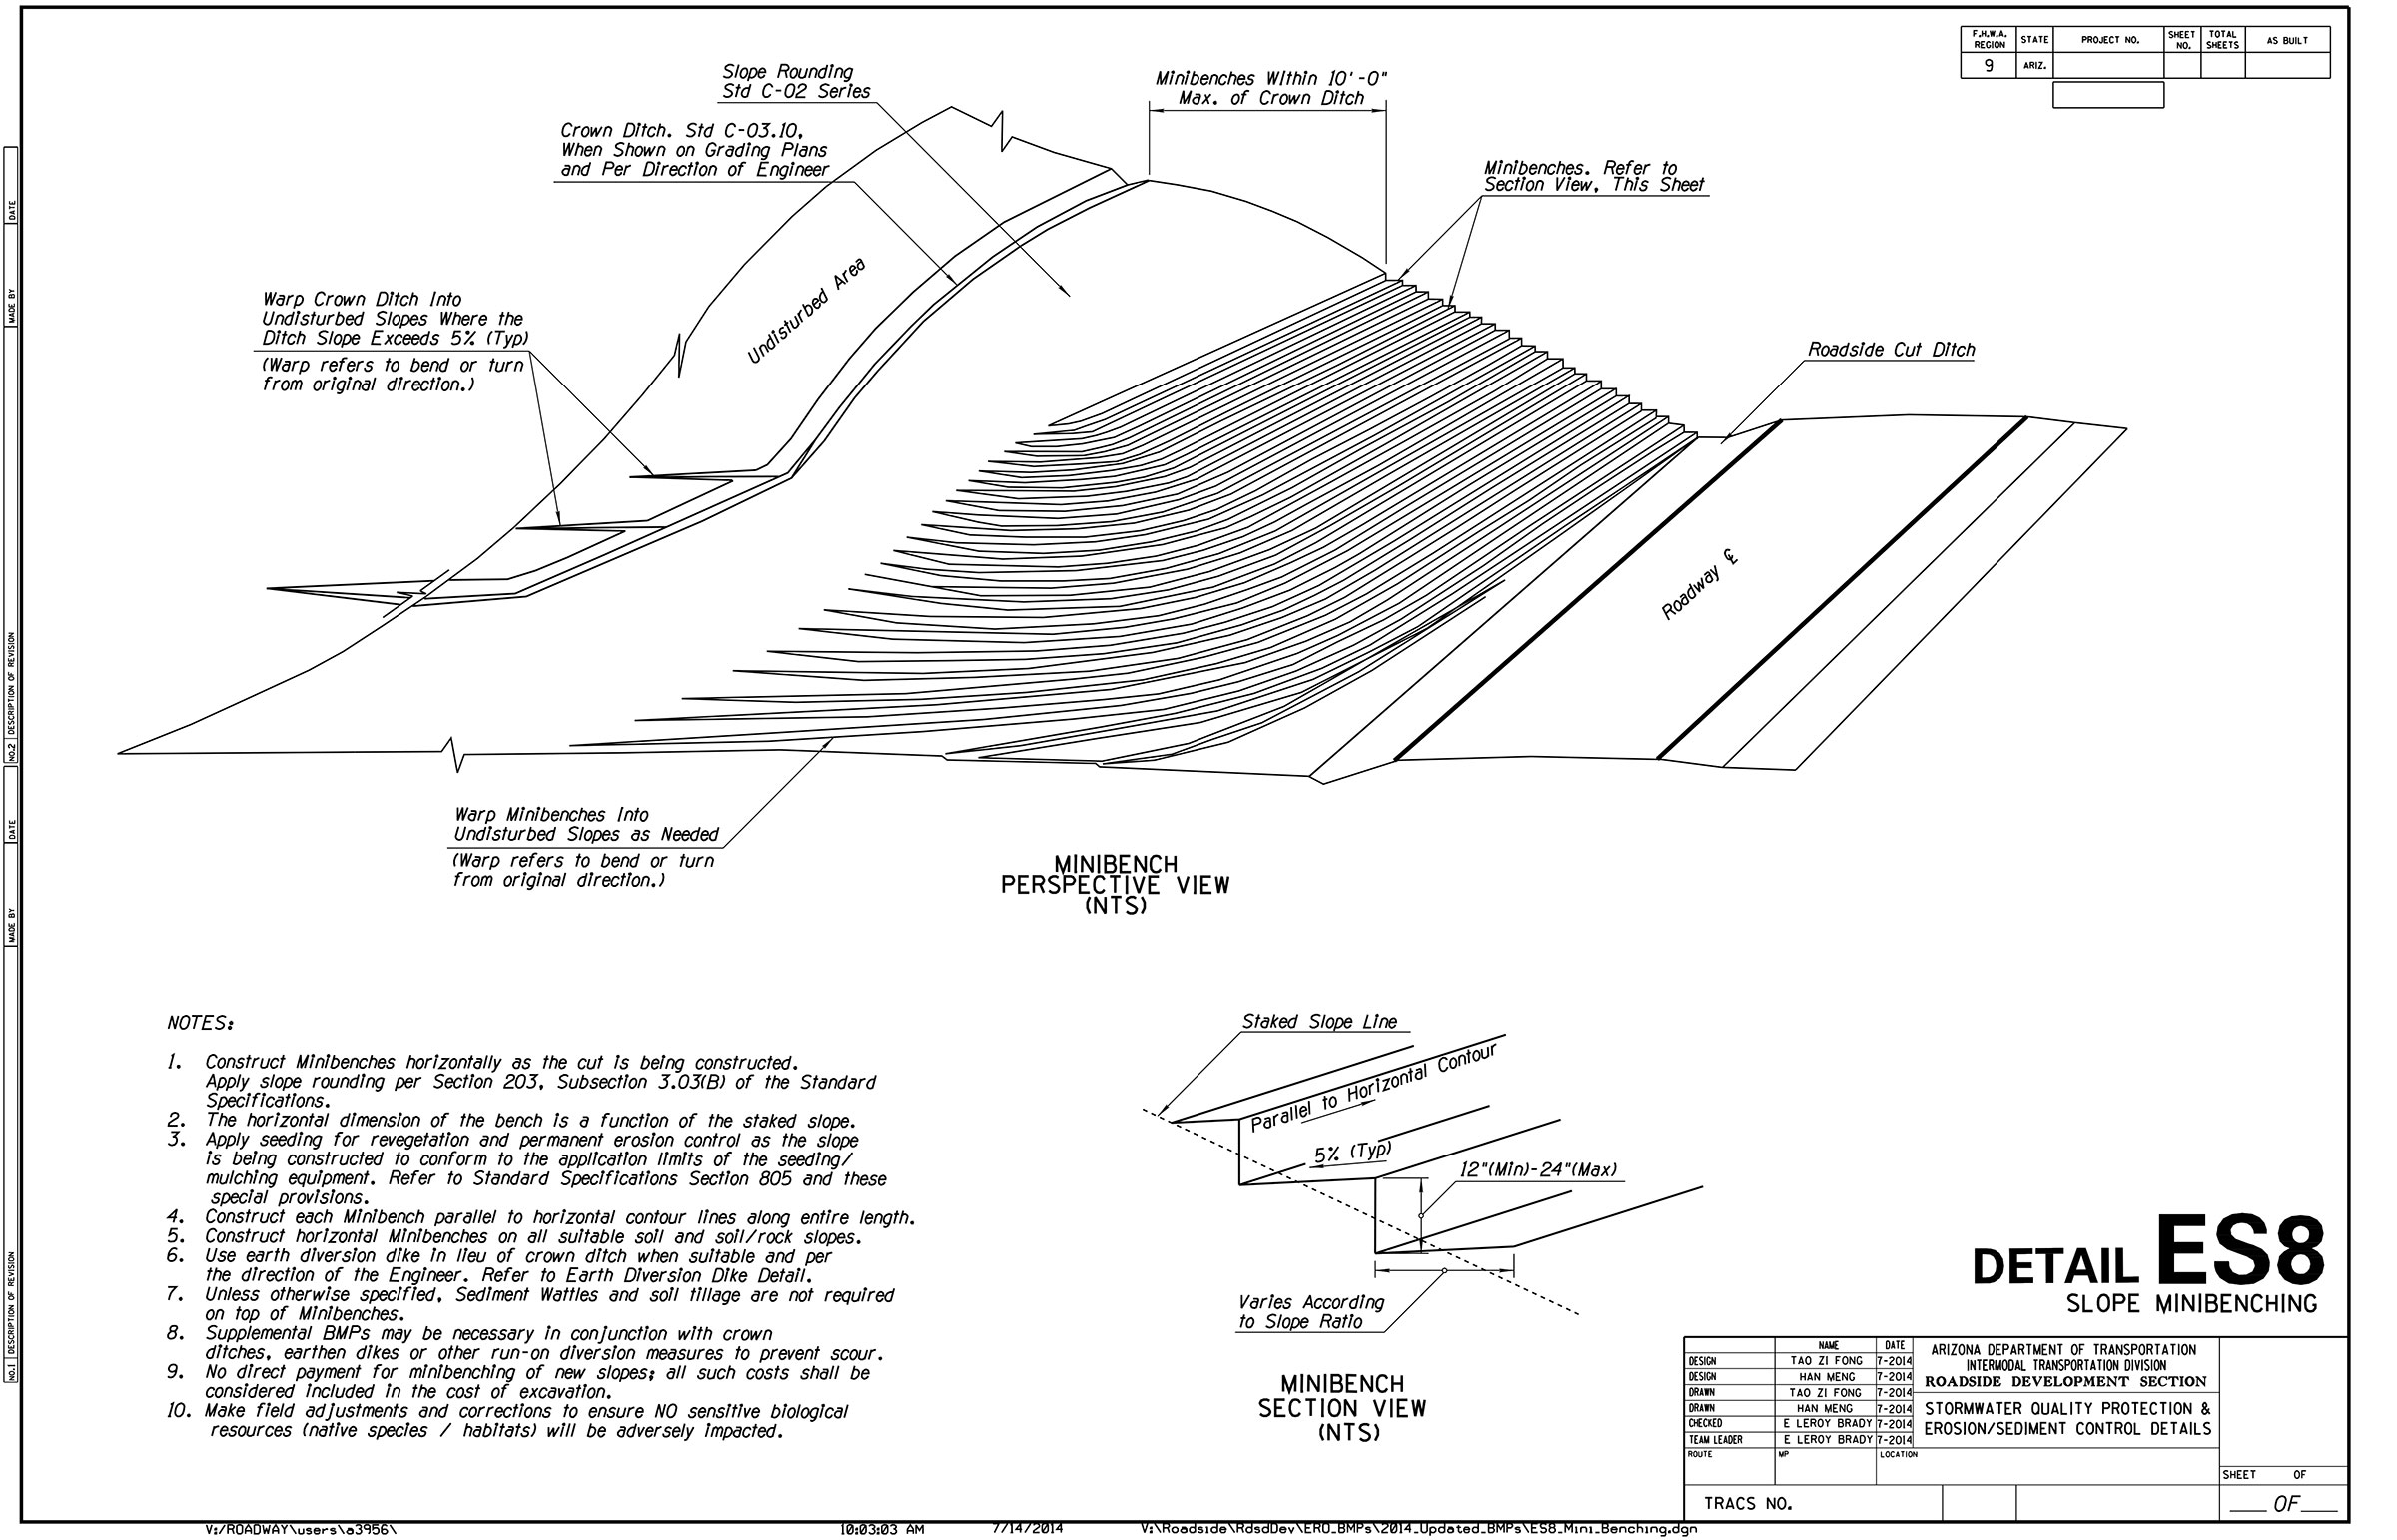 Minibench plan drawing.